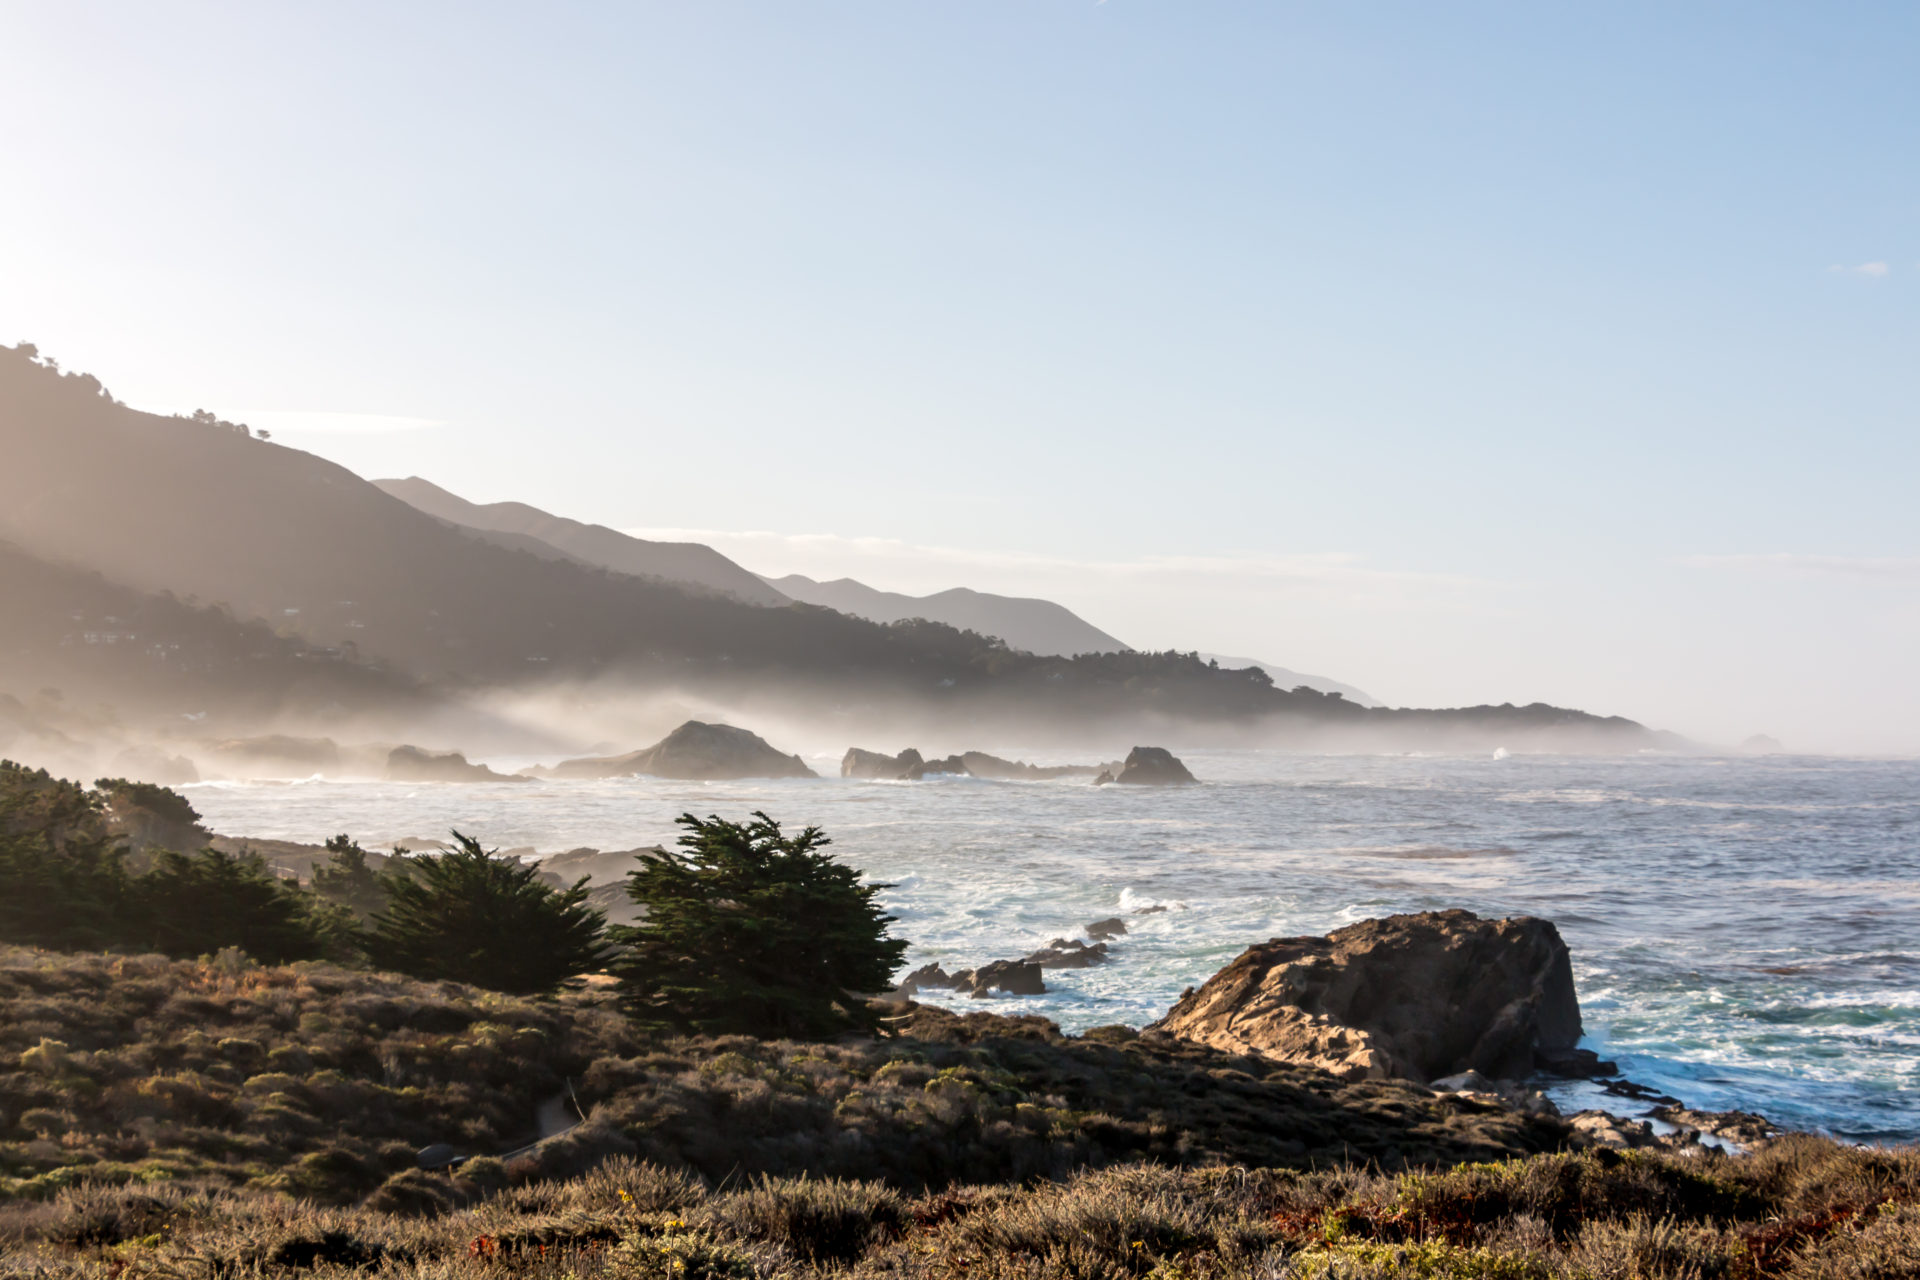 Monterey – Santa Barbara